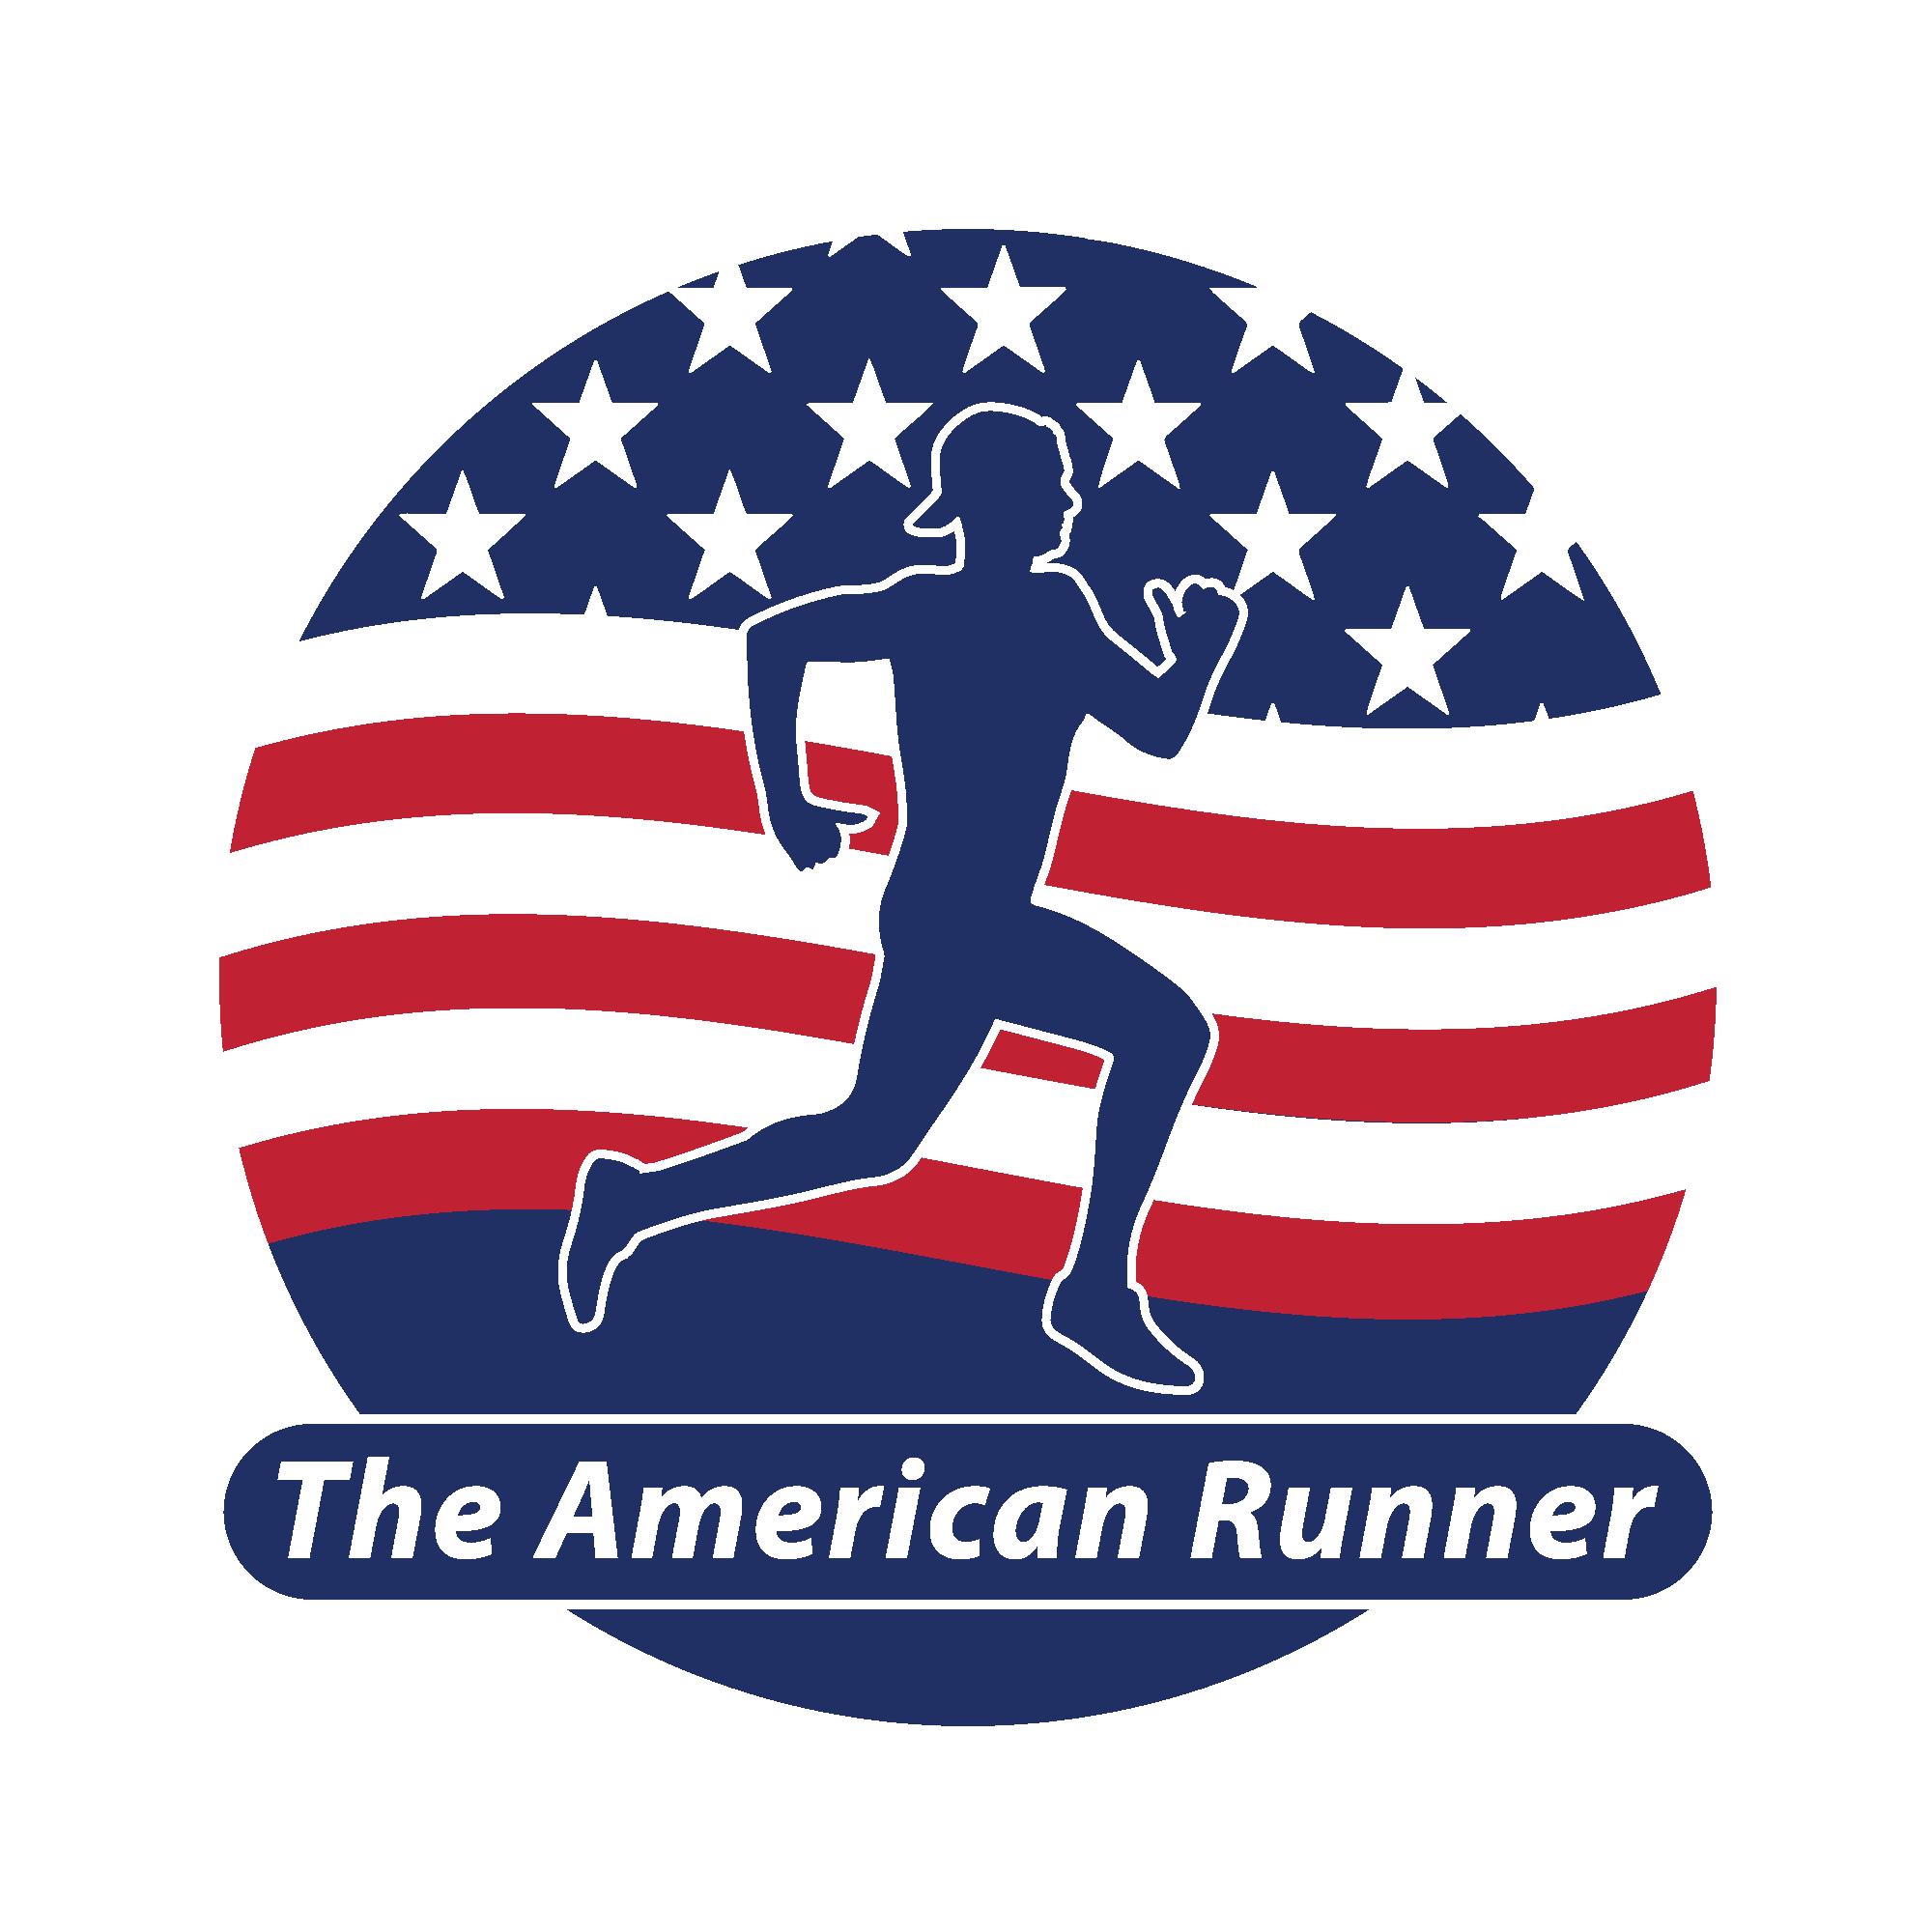 The American Runner